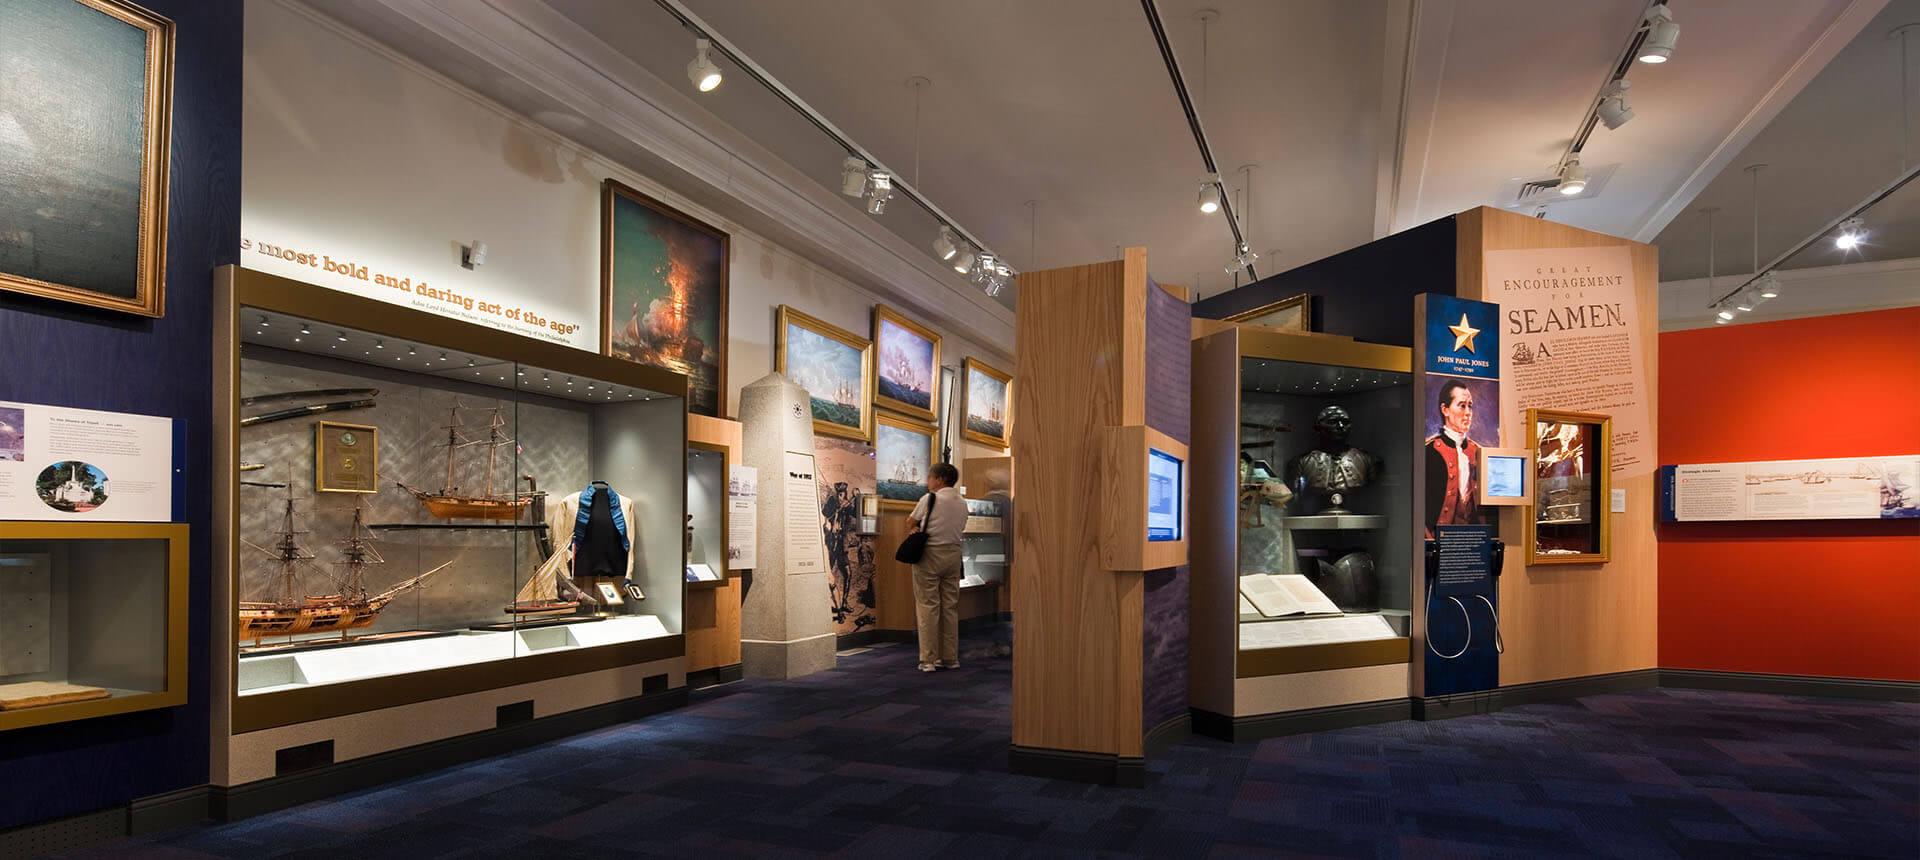 U.S. Naval Academy: Preble Hall Museum - CallisonRTKL